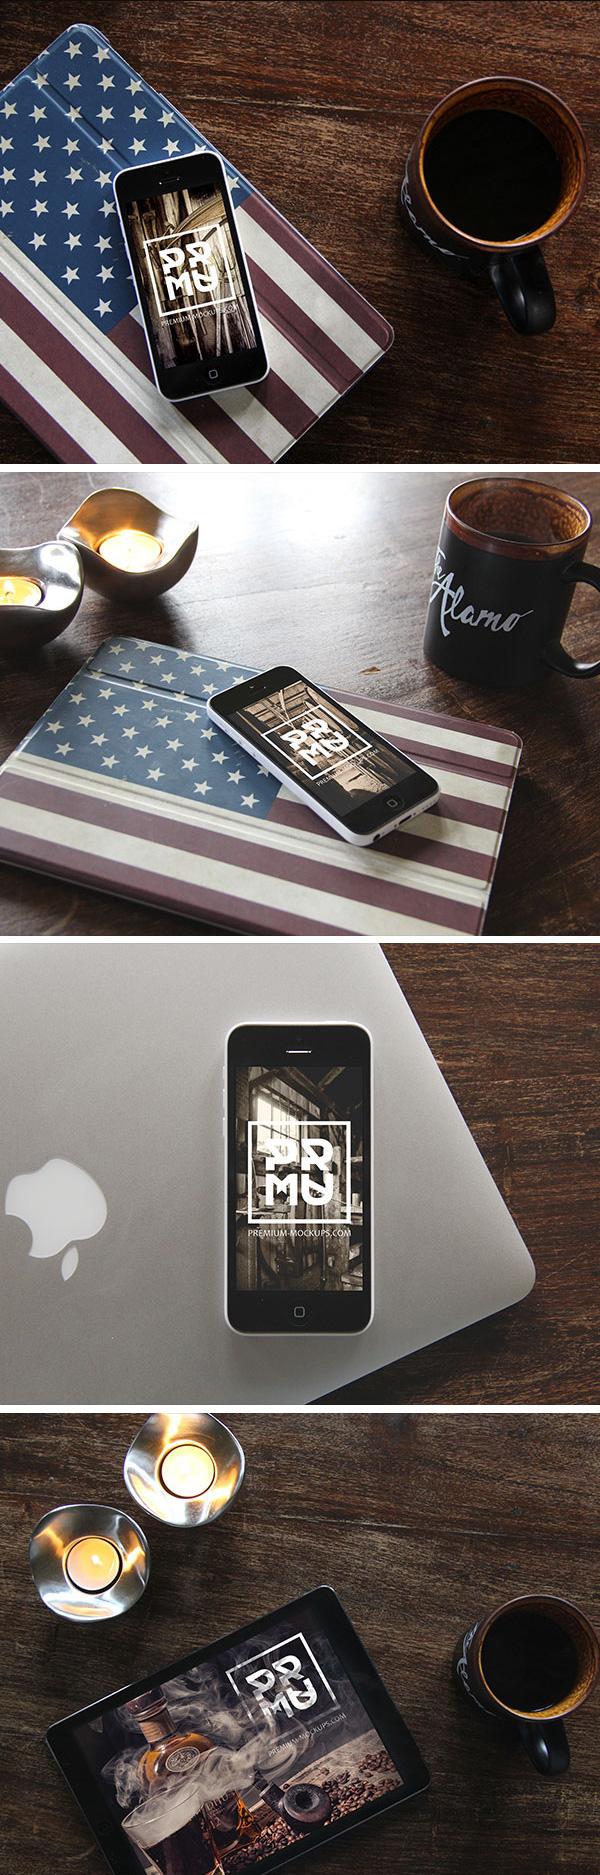 iPhone & iPad Photo MockUps | GraphicBurger